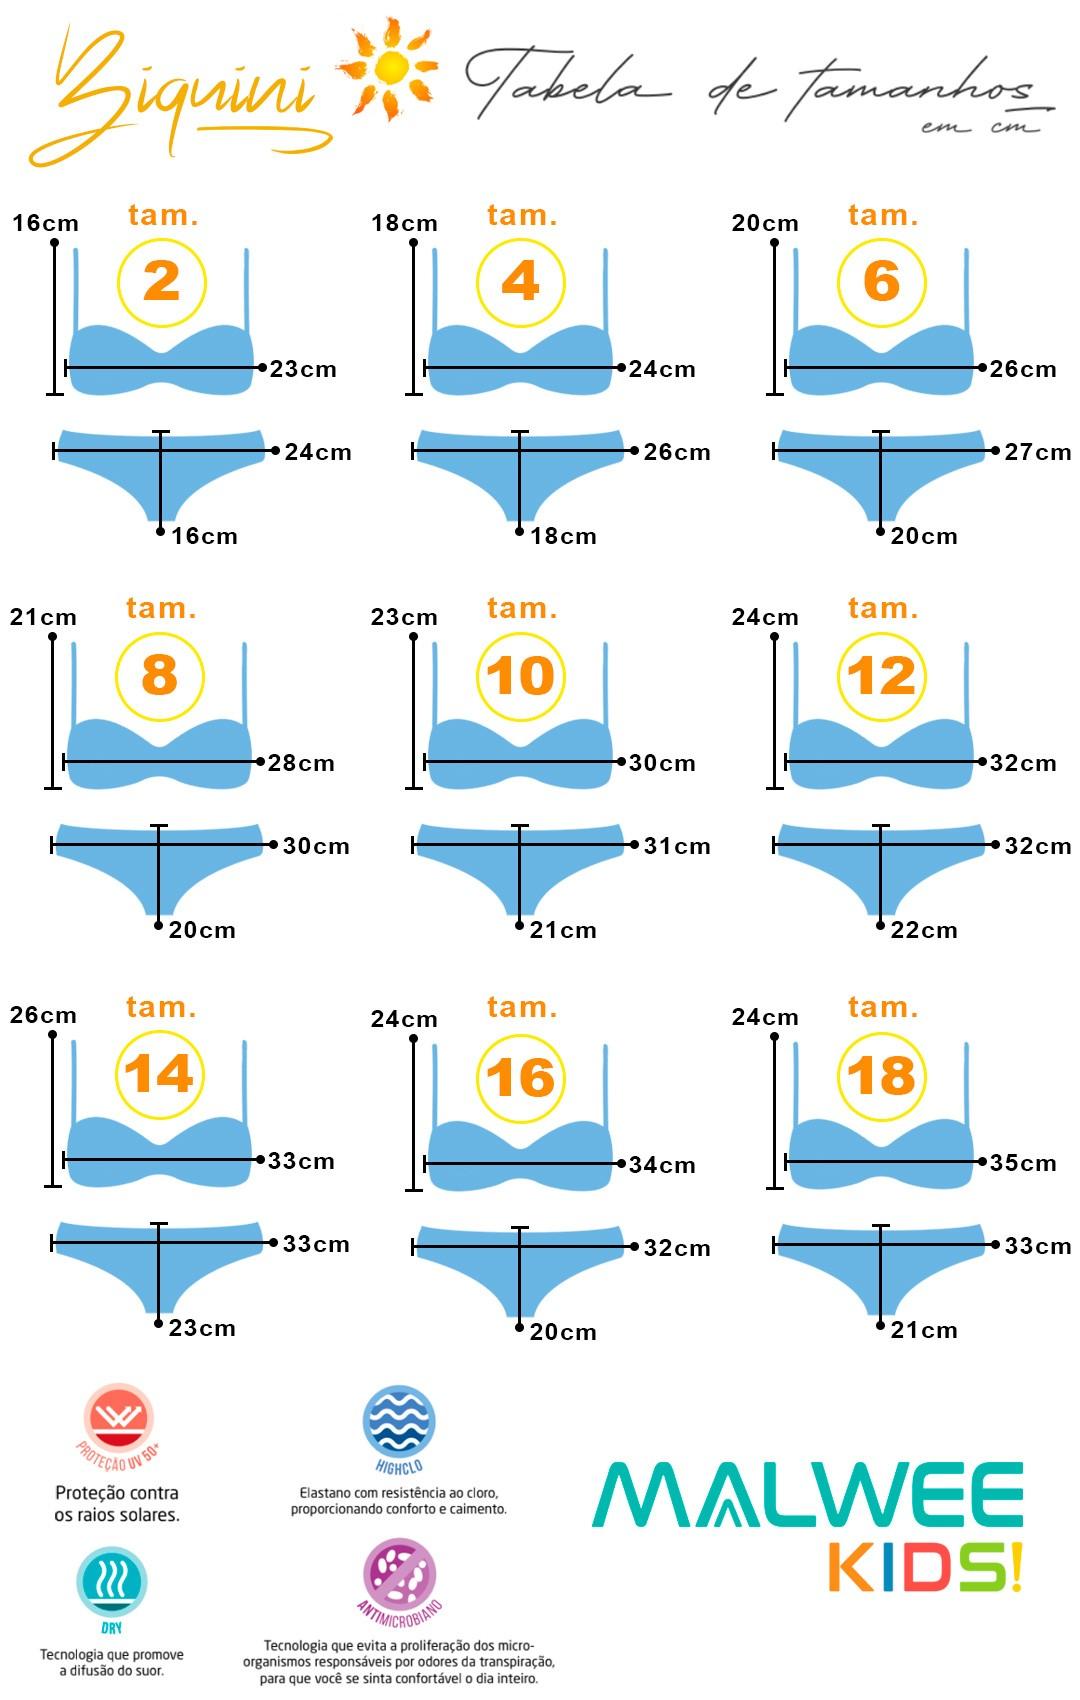 Biquini Infantil Verão Rosa Tie Dye Malwee: Tabela de medidas